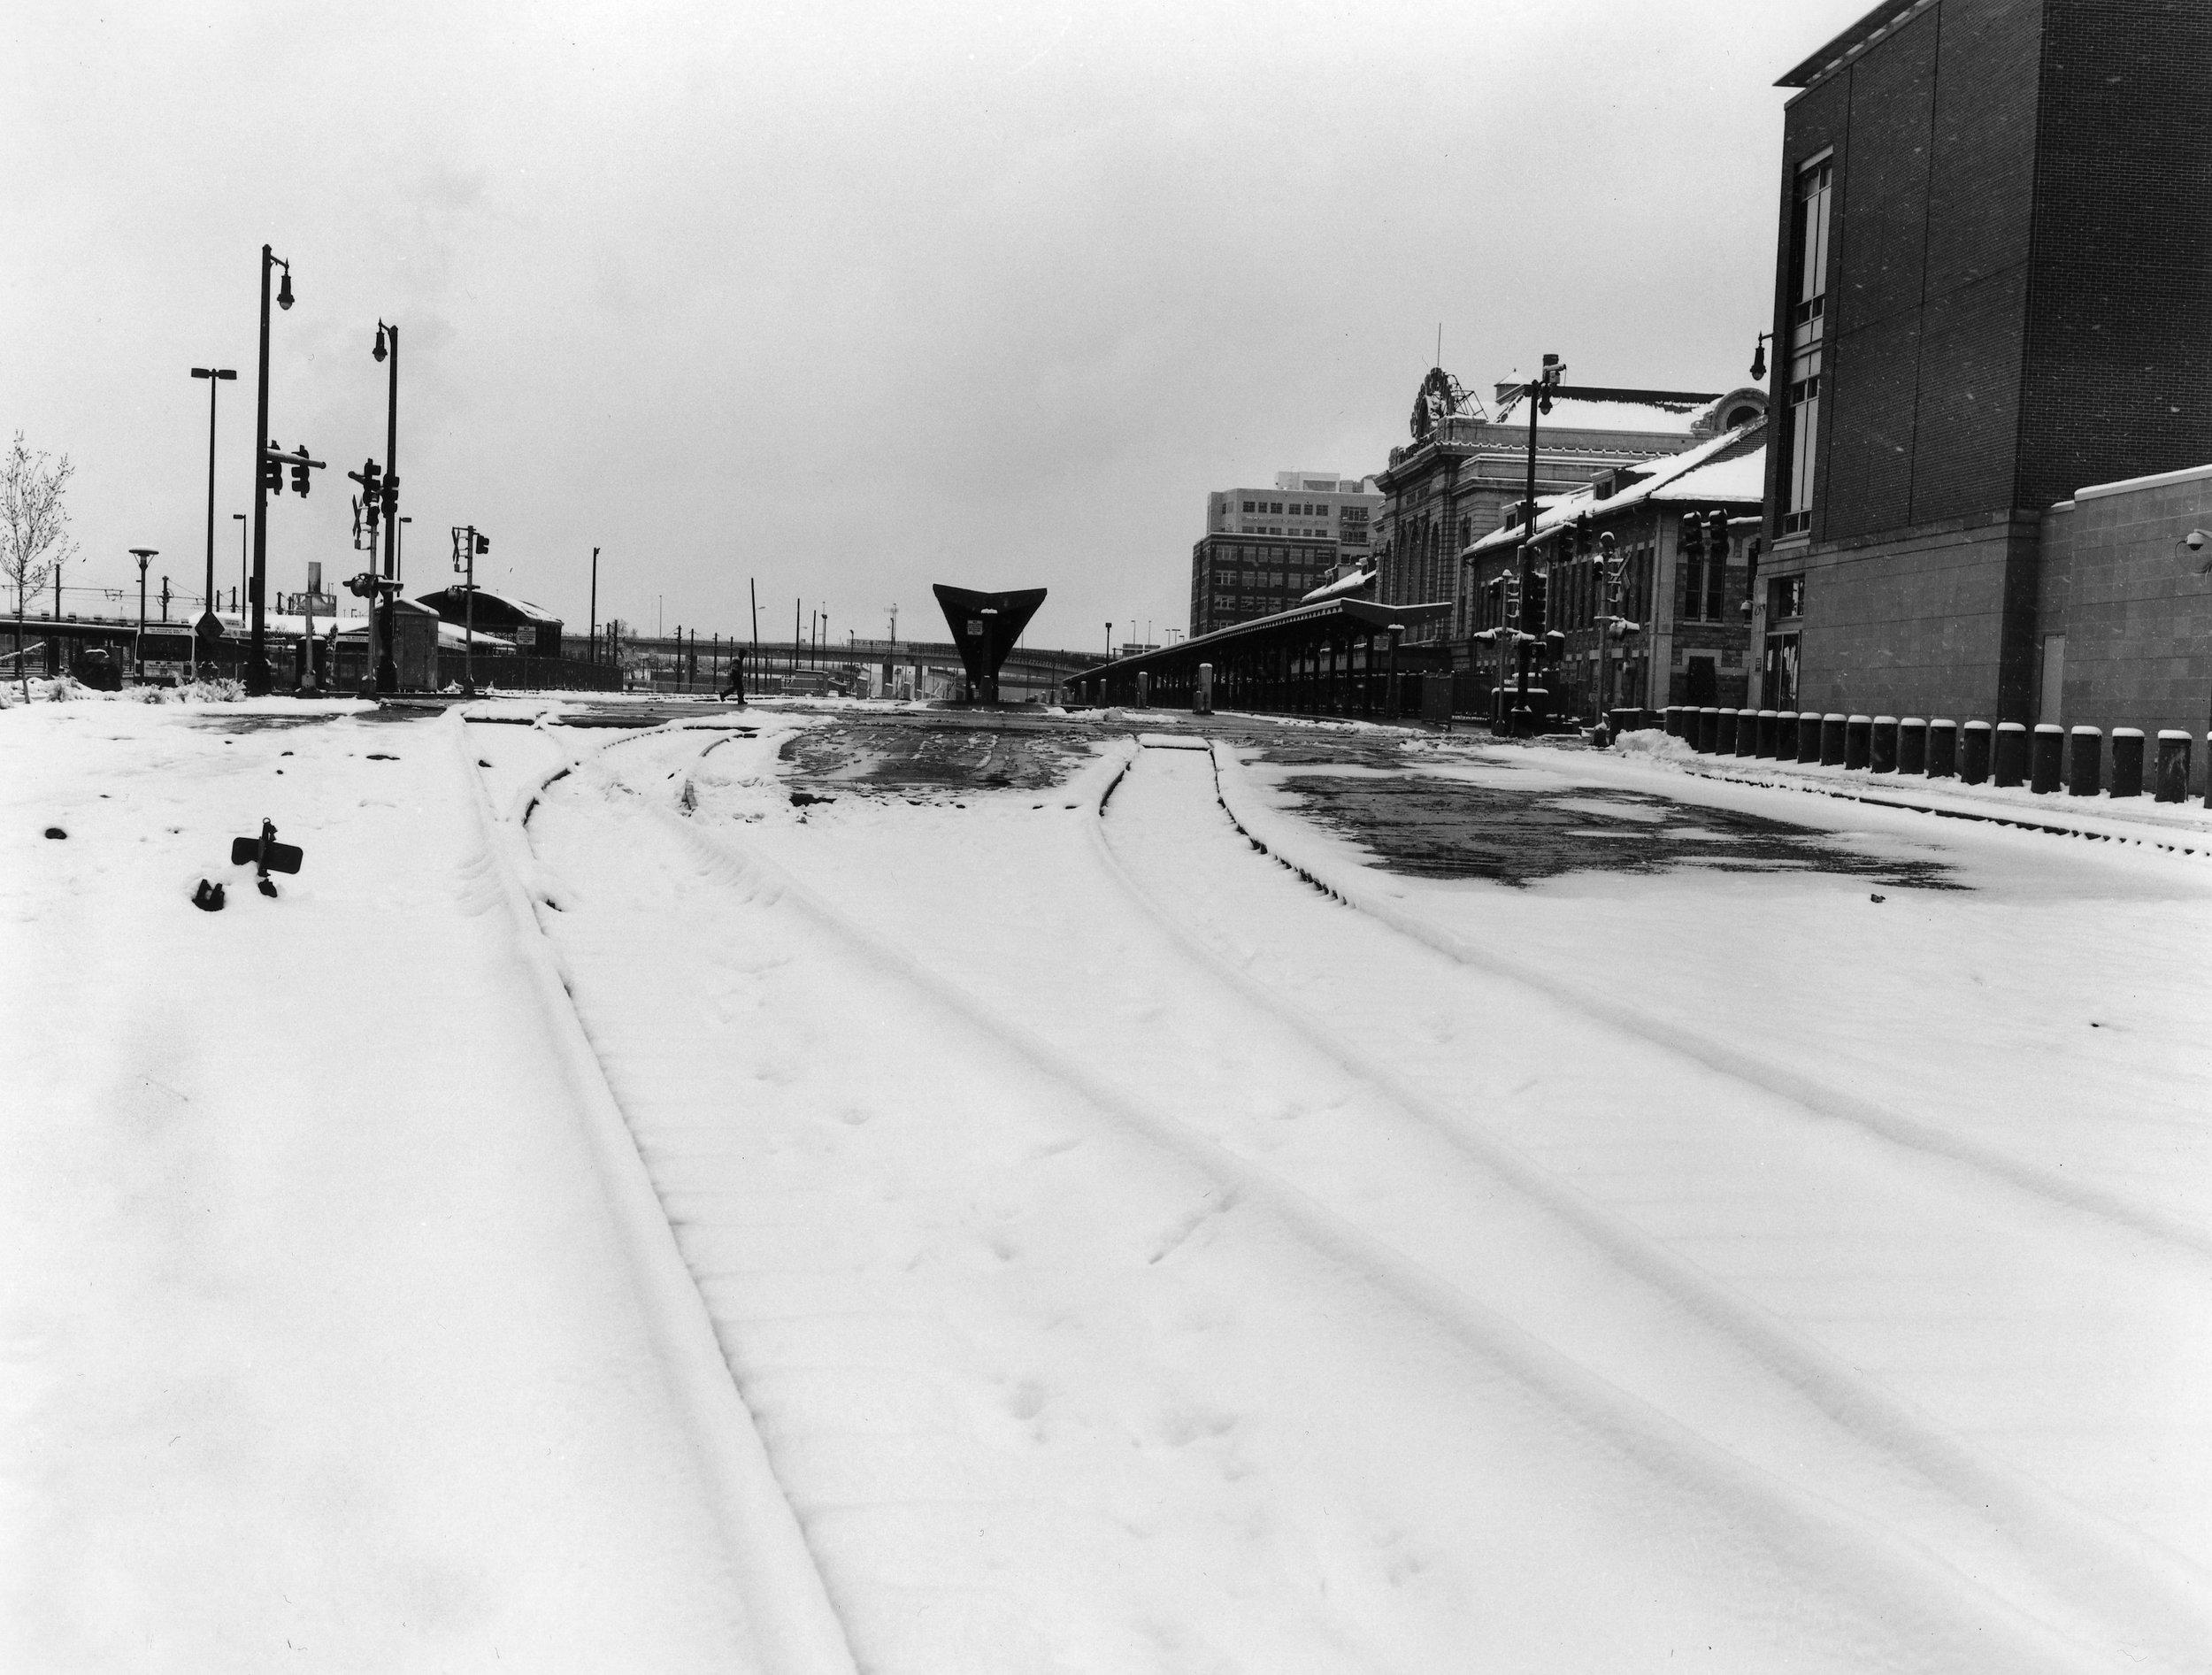 Tracks of Union Station